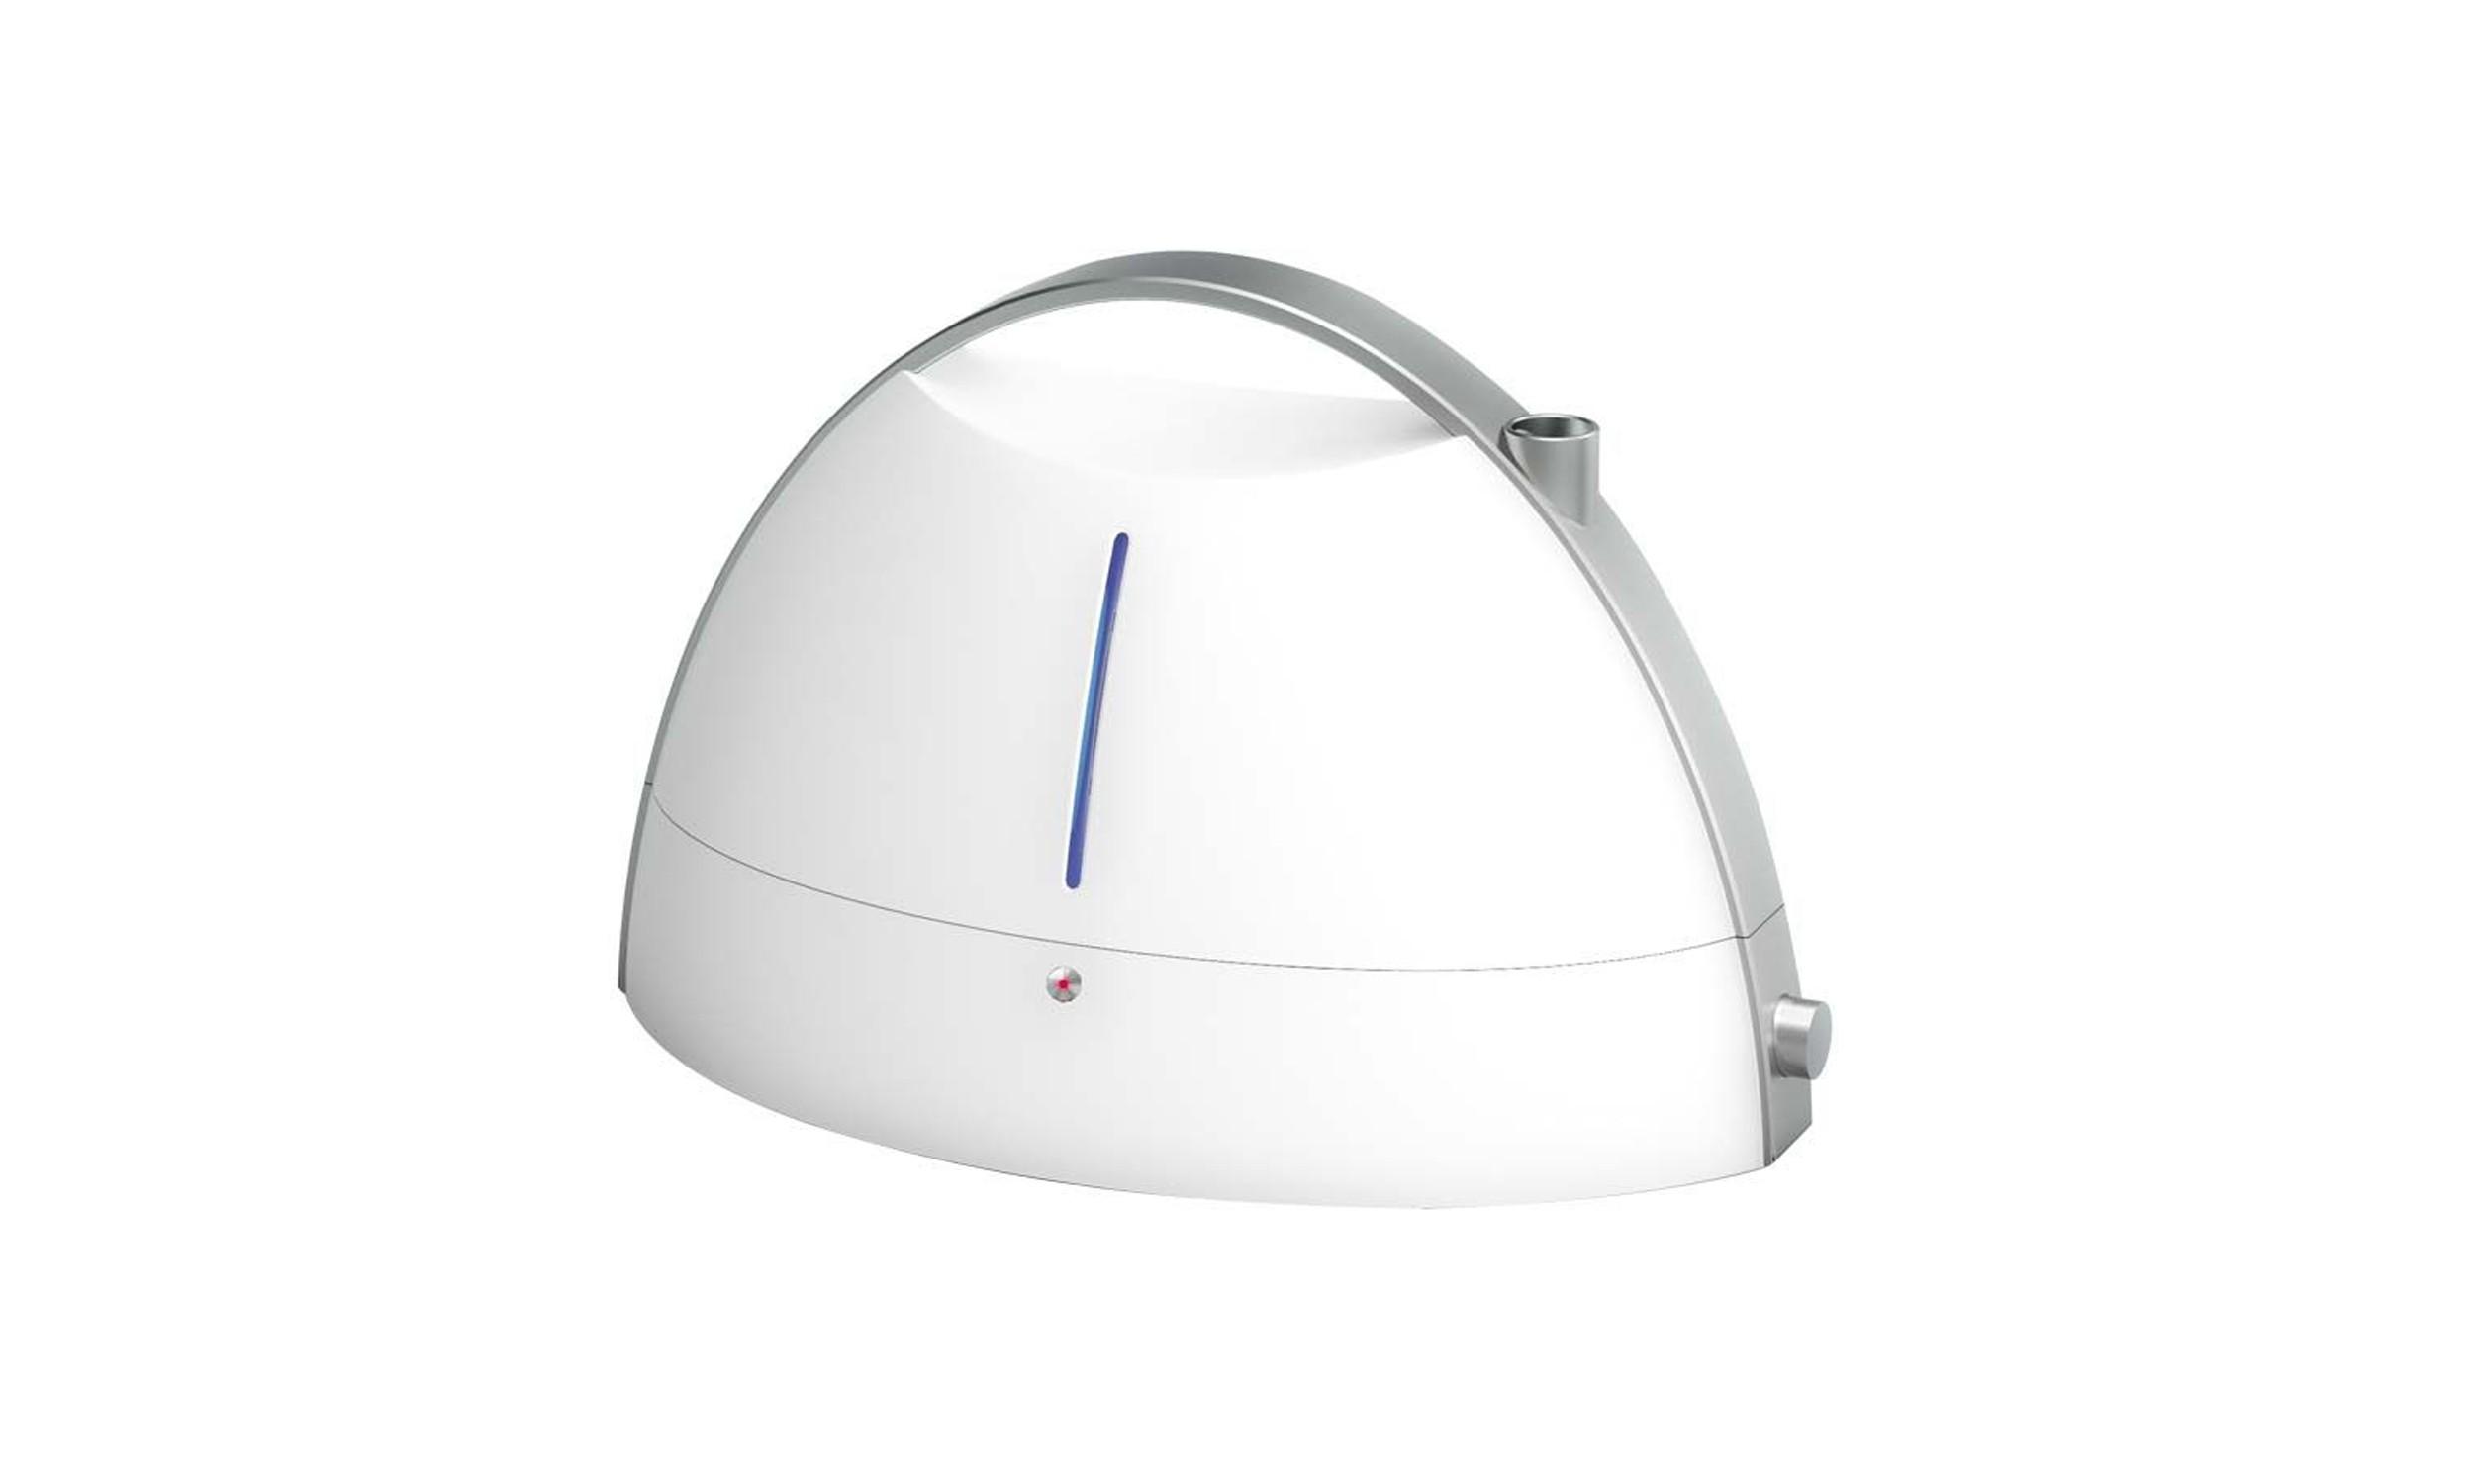 Ultrasonic humidifier AIRSANO ARCO ORIEME